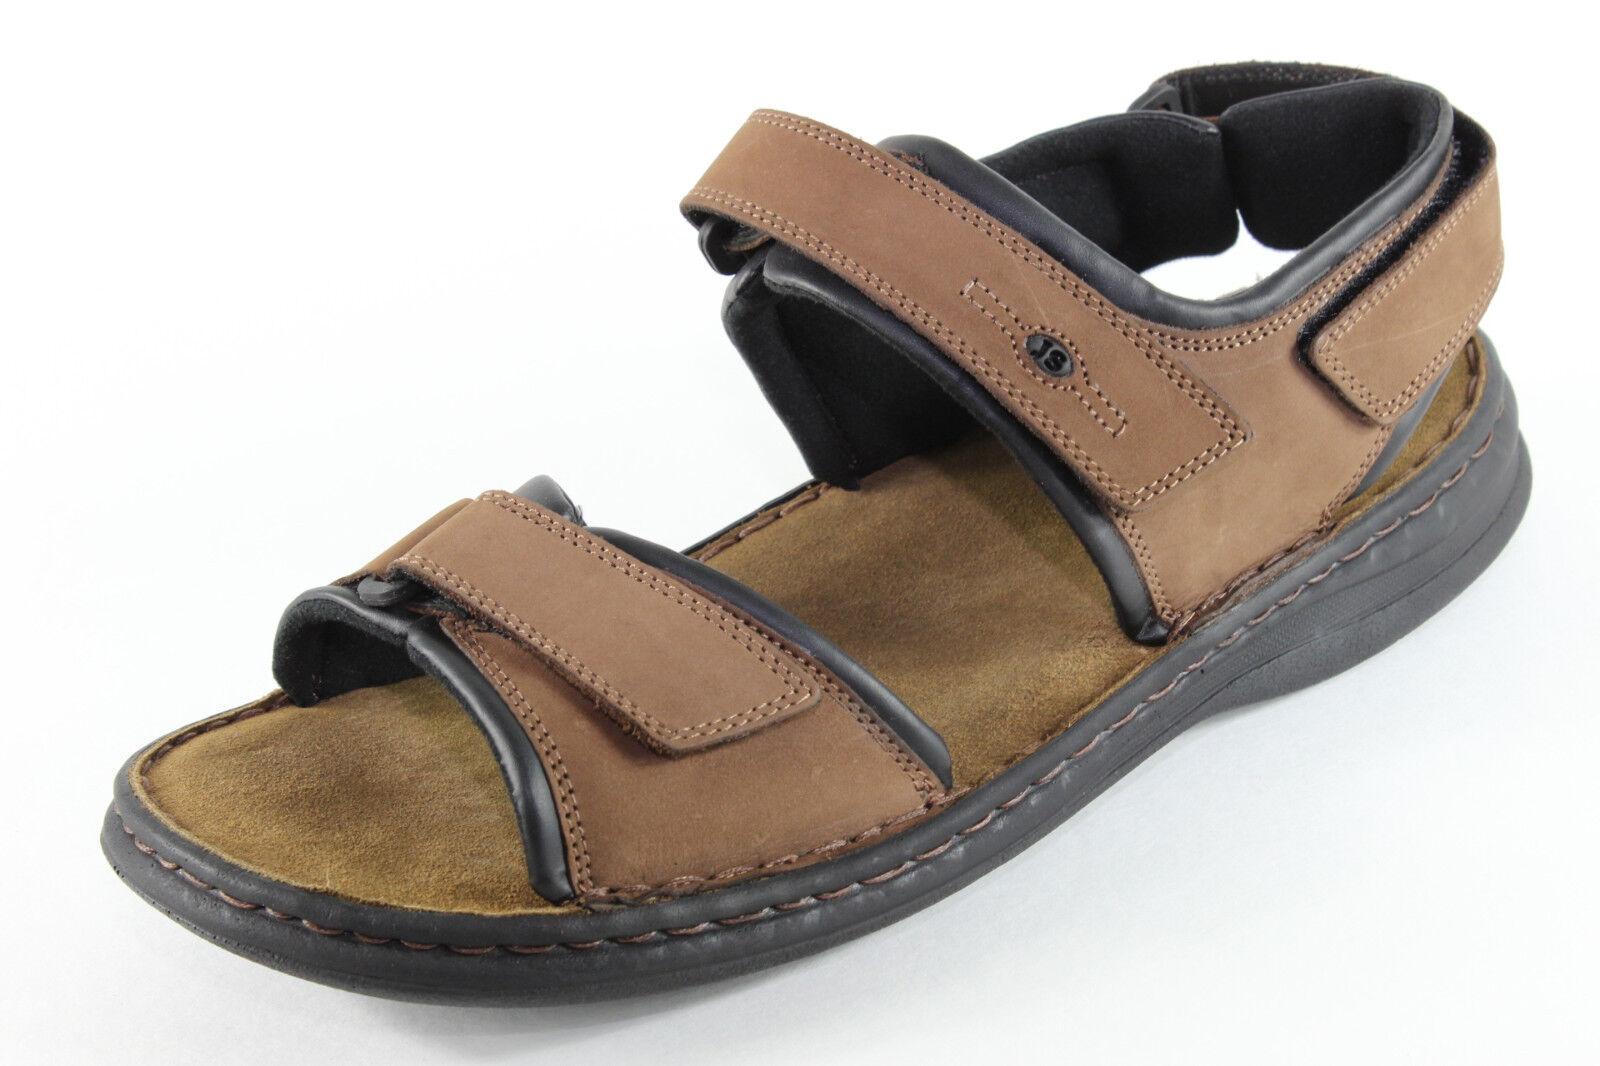 Josef Seibel Rafe, Sandale, komfortable Sandale, Rafe, Herrenschuhe Übergröße 2ce59d